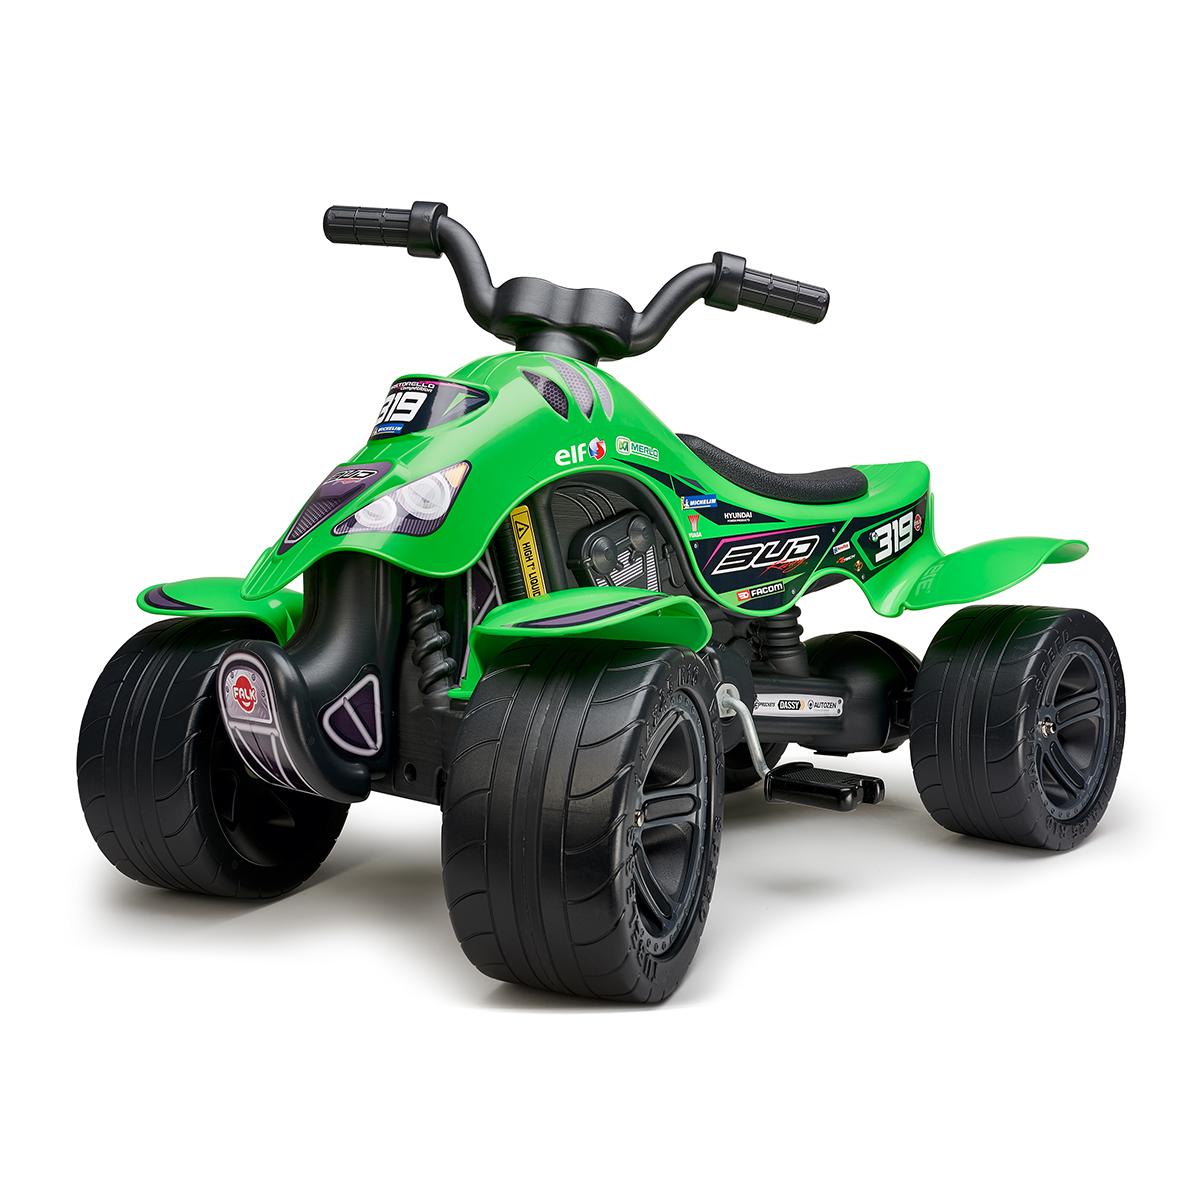 609BR_falk_quad_pedales_bud_racing_1